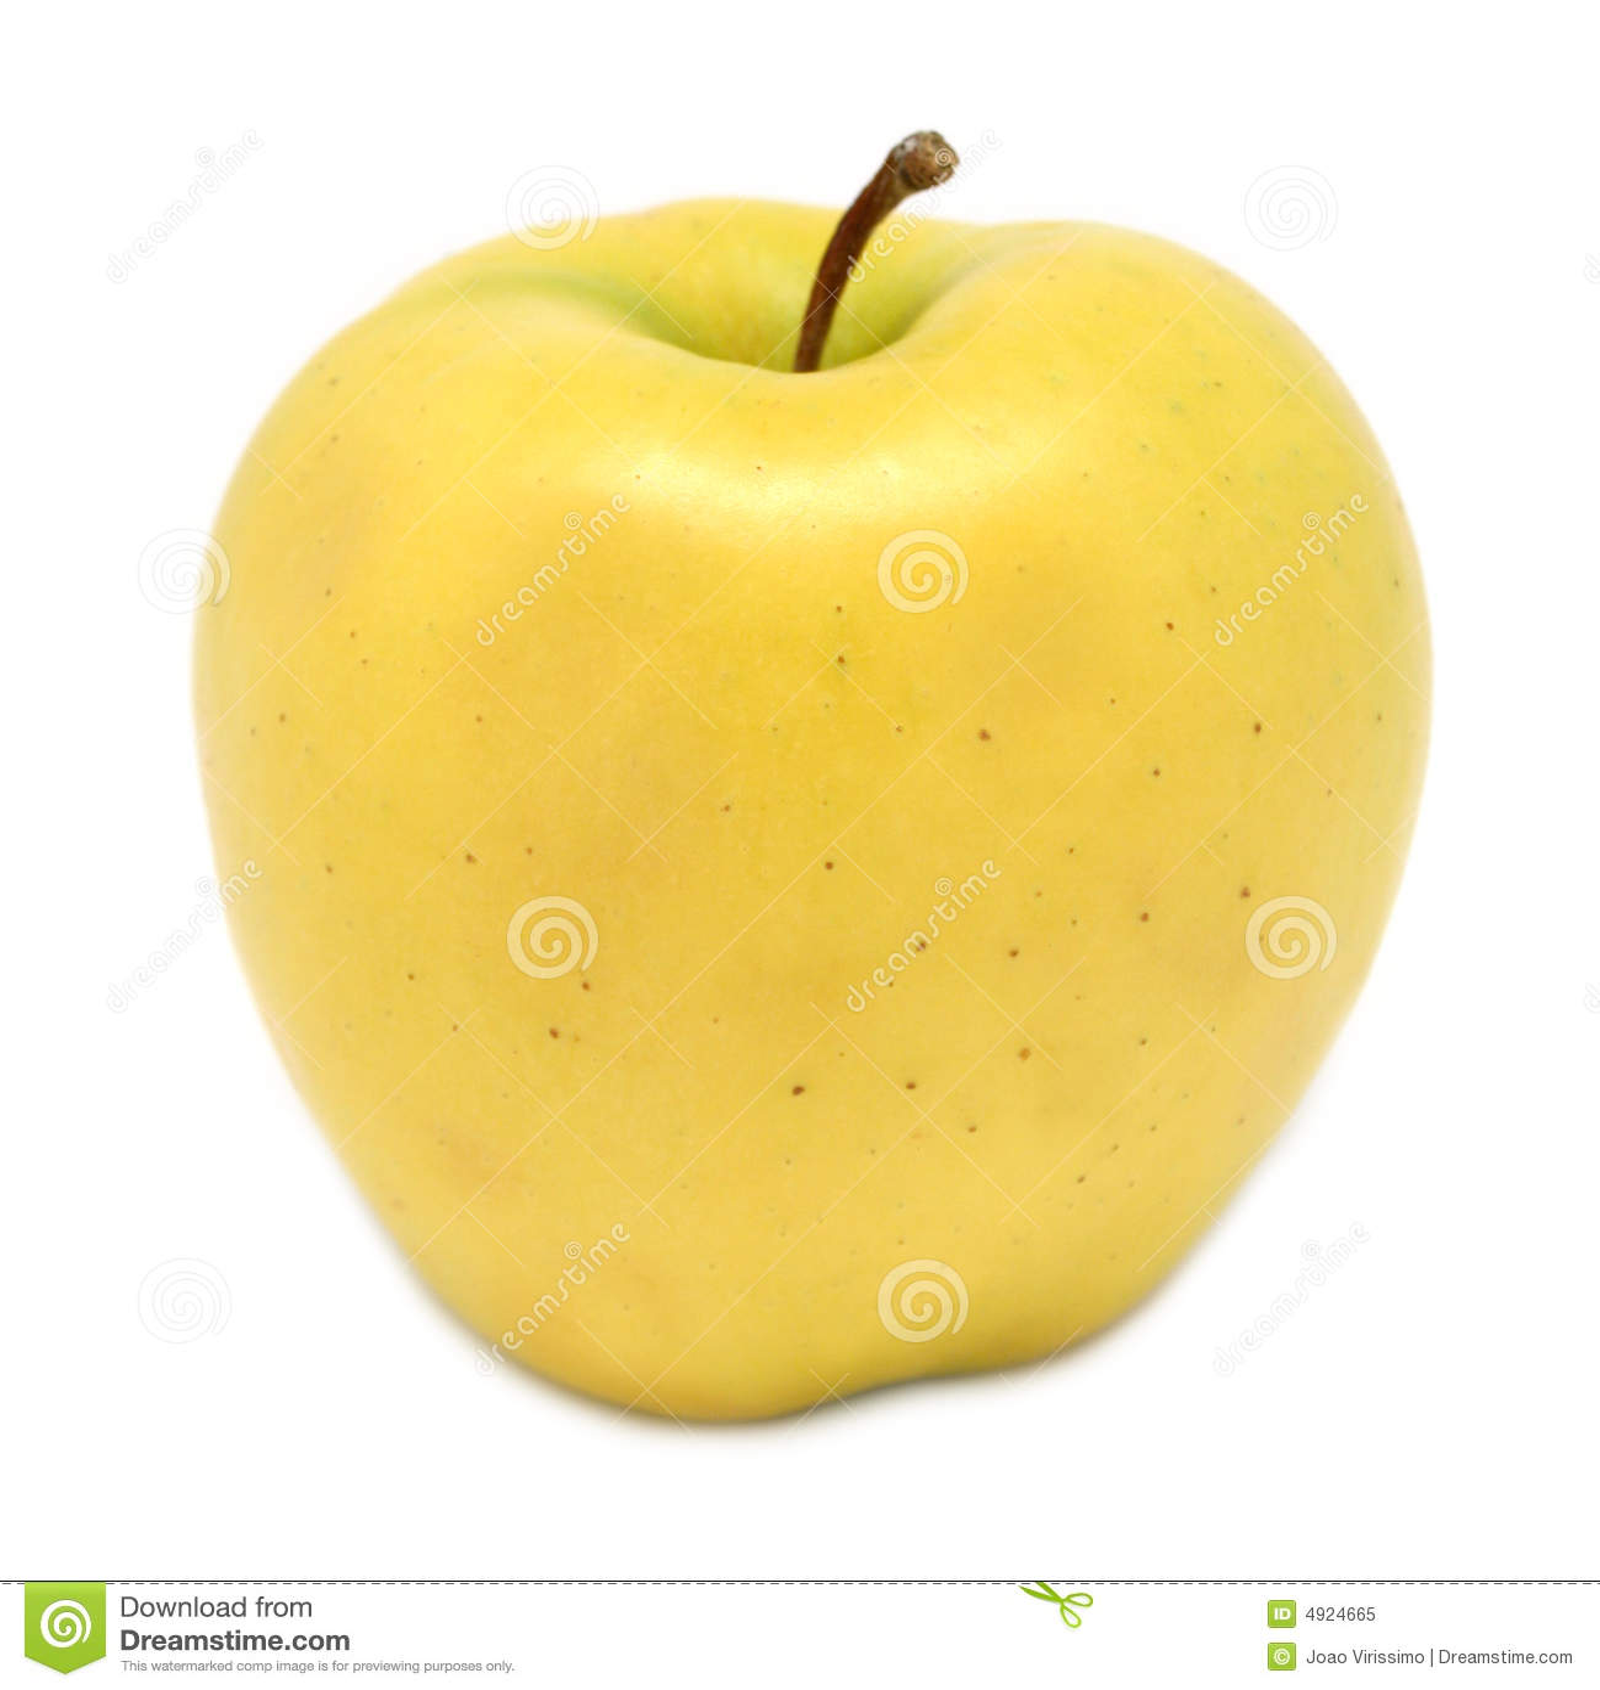 golden delicious pollinator